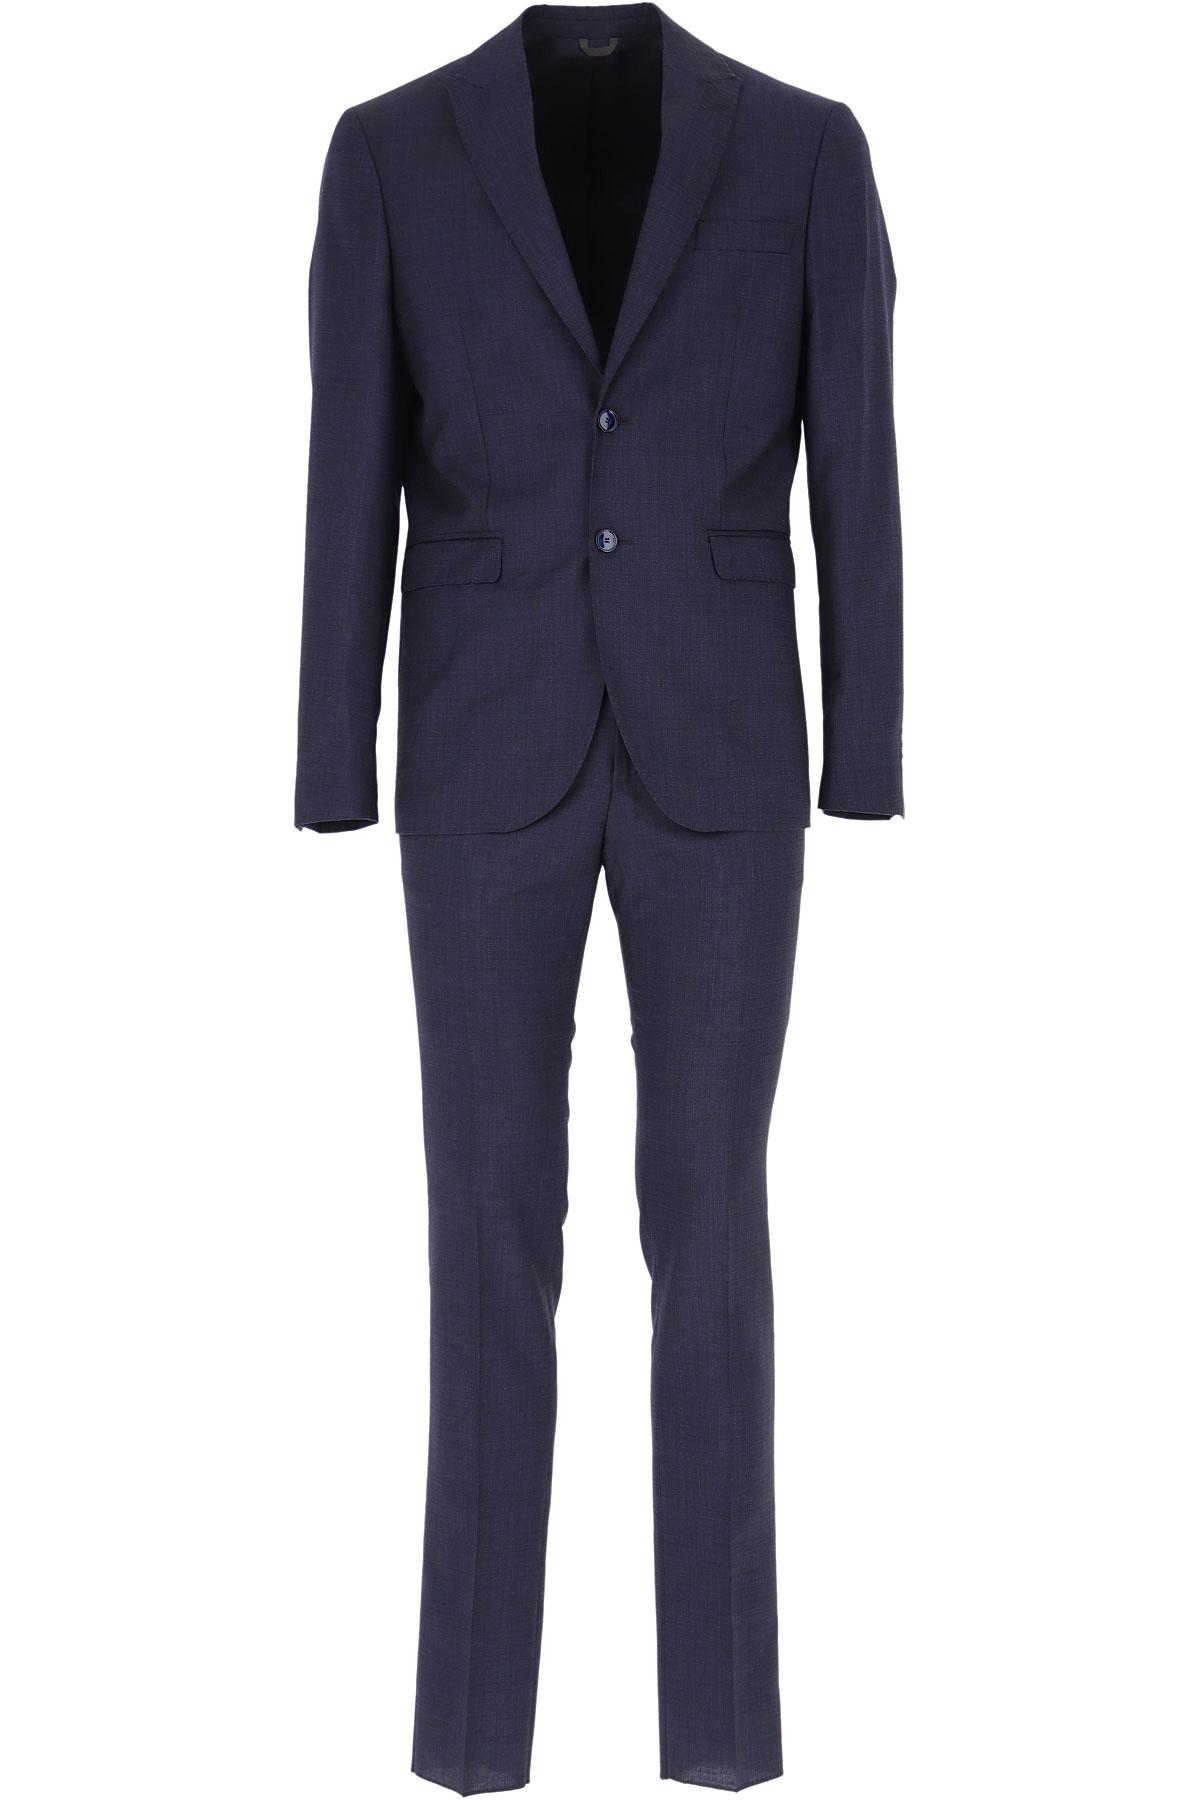 Simbols Men's Suit On Sale, Dark Ocean Blue, Virgin wool, 2019, L M S XL XXL XXXL